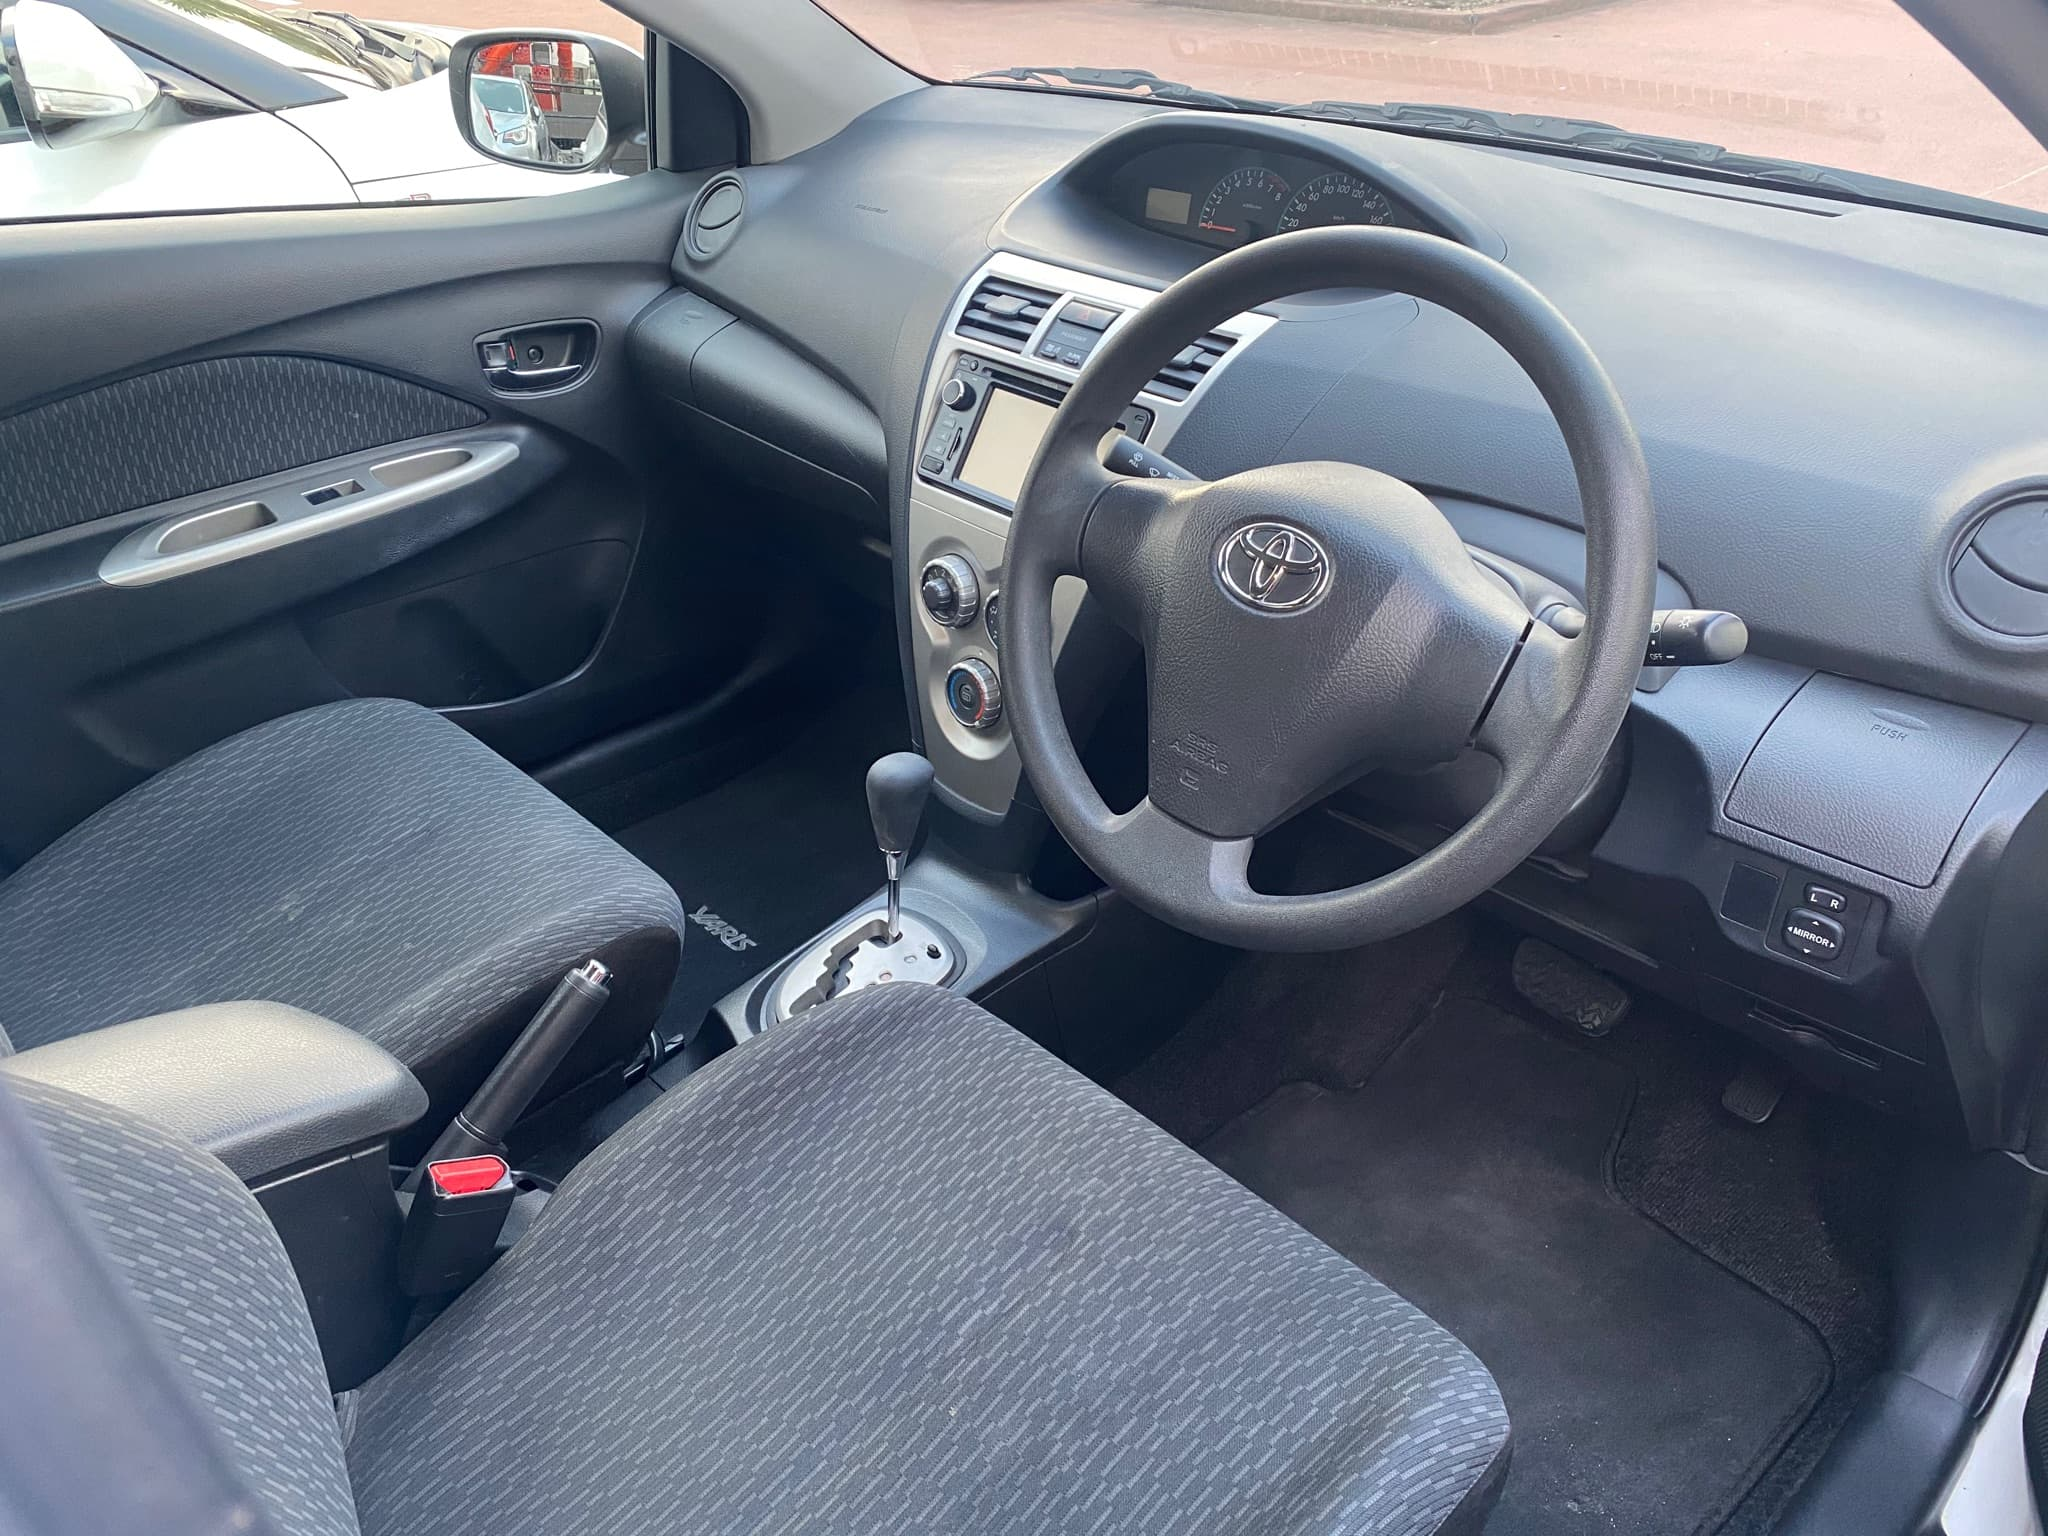 2016 Toyota Yaris YRS Auto - image 10